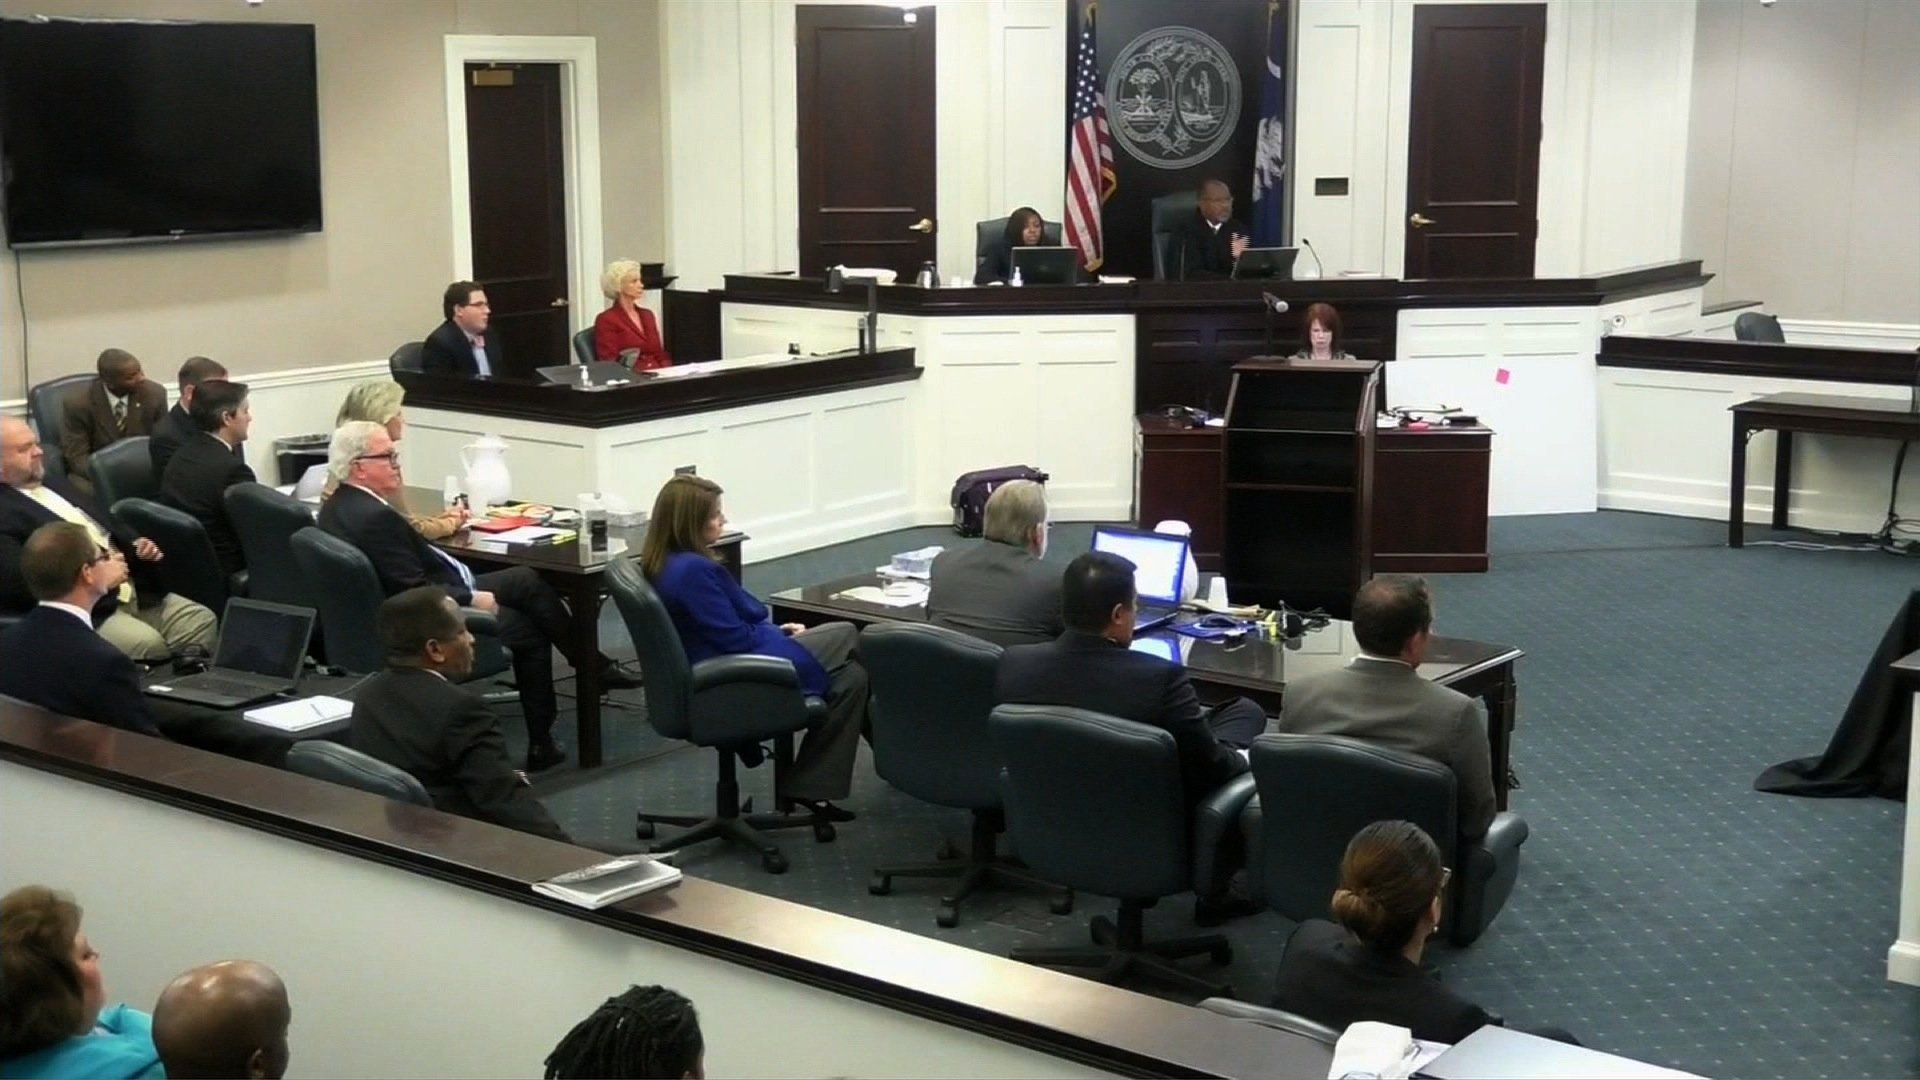 Image result for Judge declares mistrial in Michael Slager trial